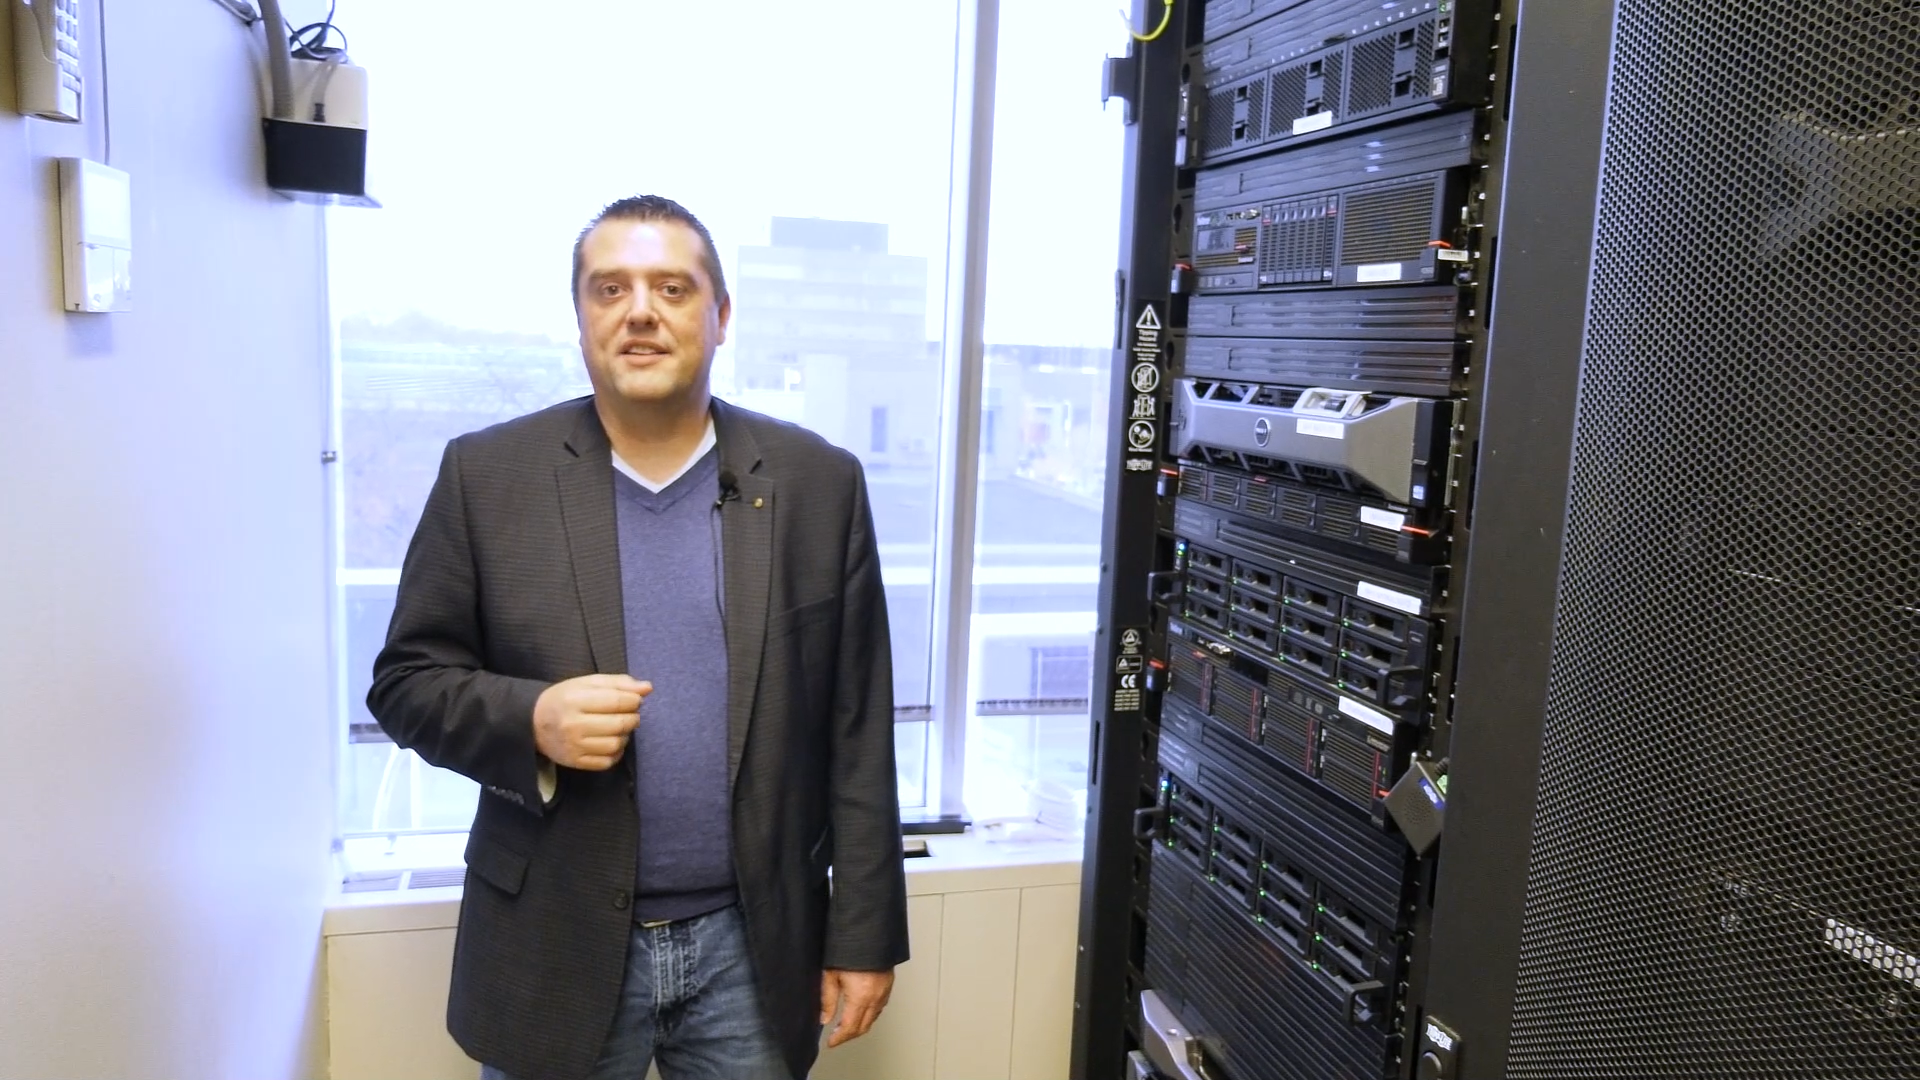 Serge standing in Server Room